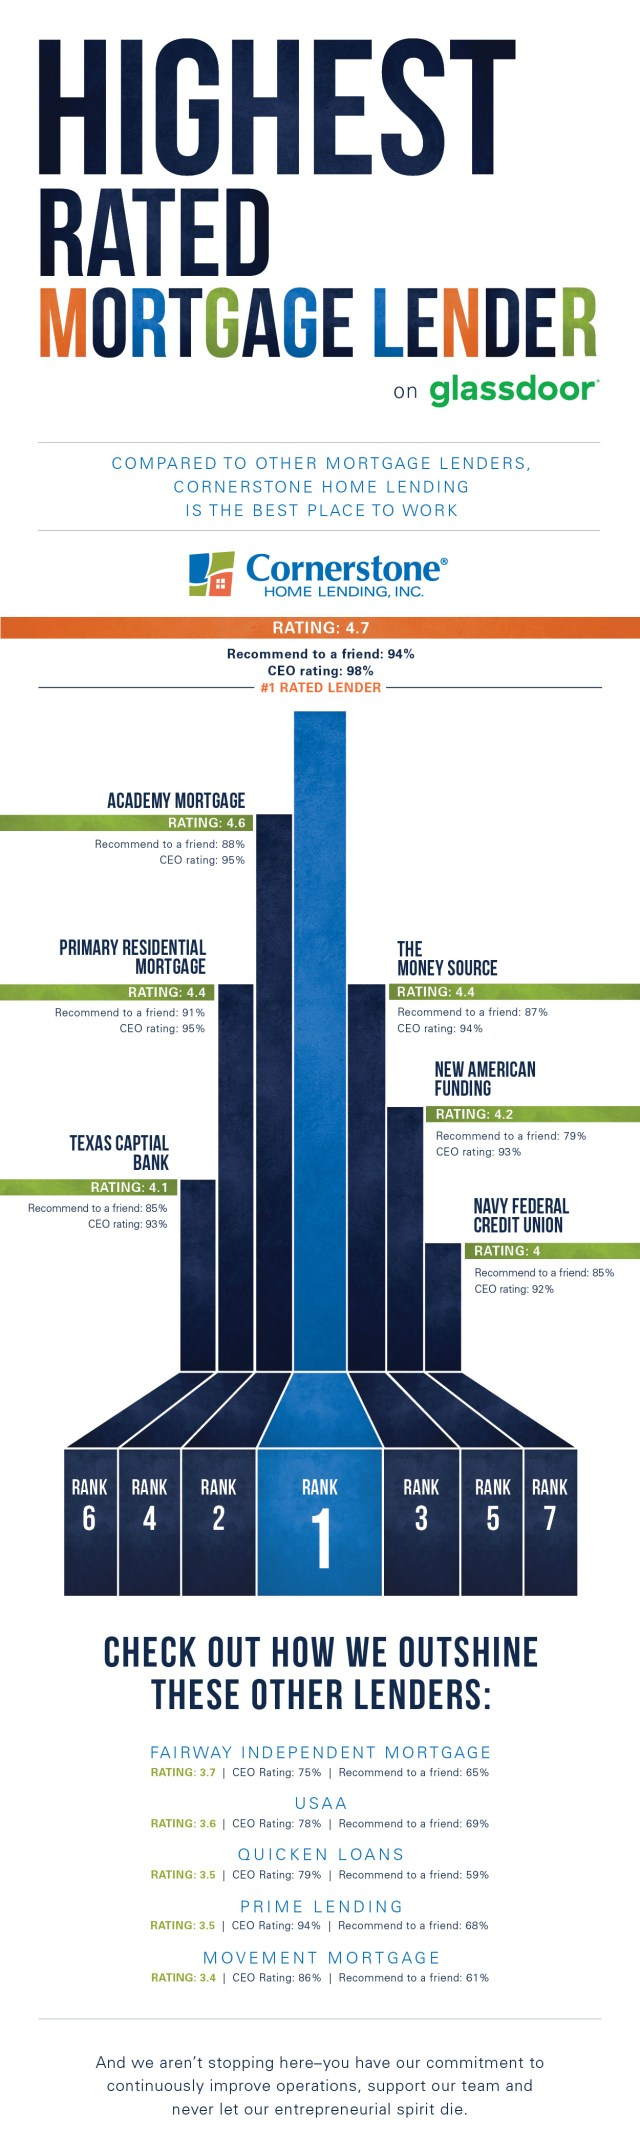 top 7 mortgage companies on glassdoor